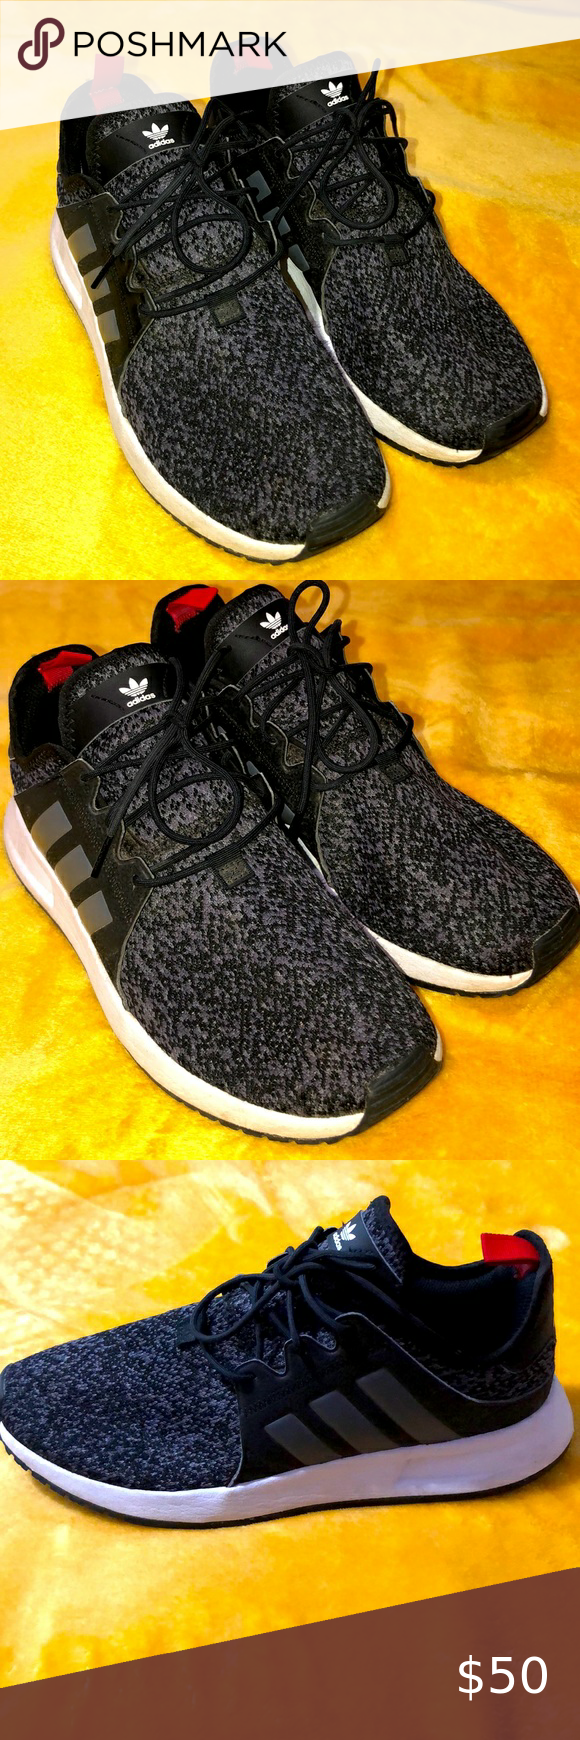 Maroon adidas shoes, Adidas athletic